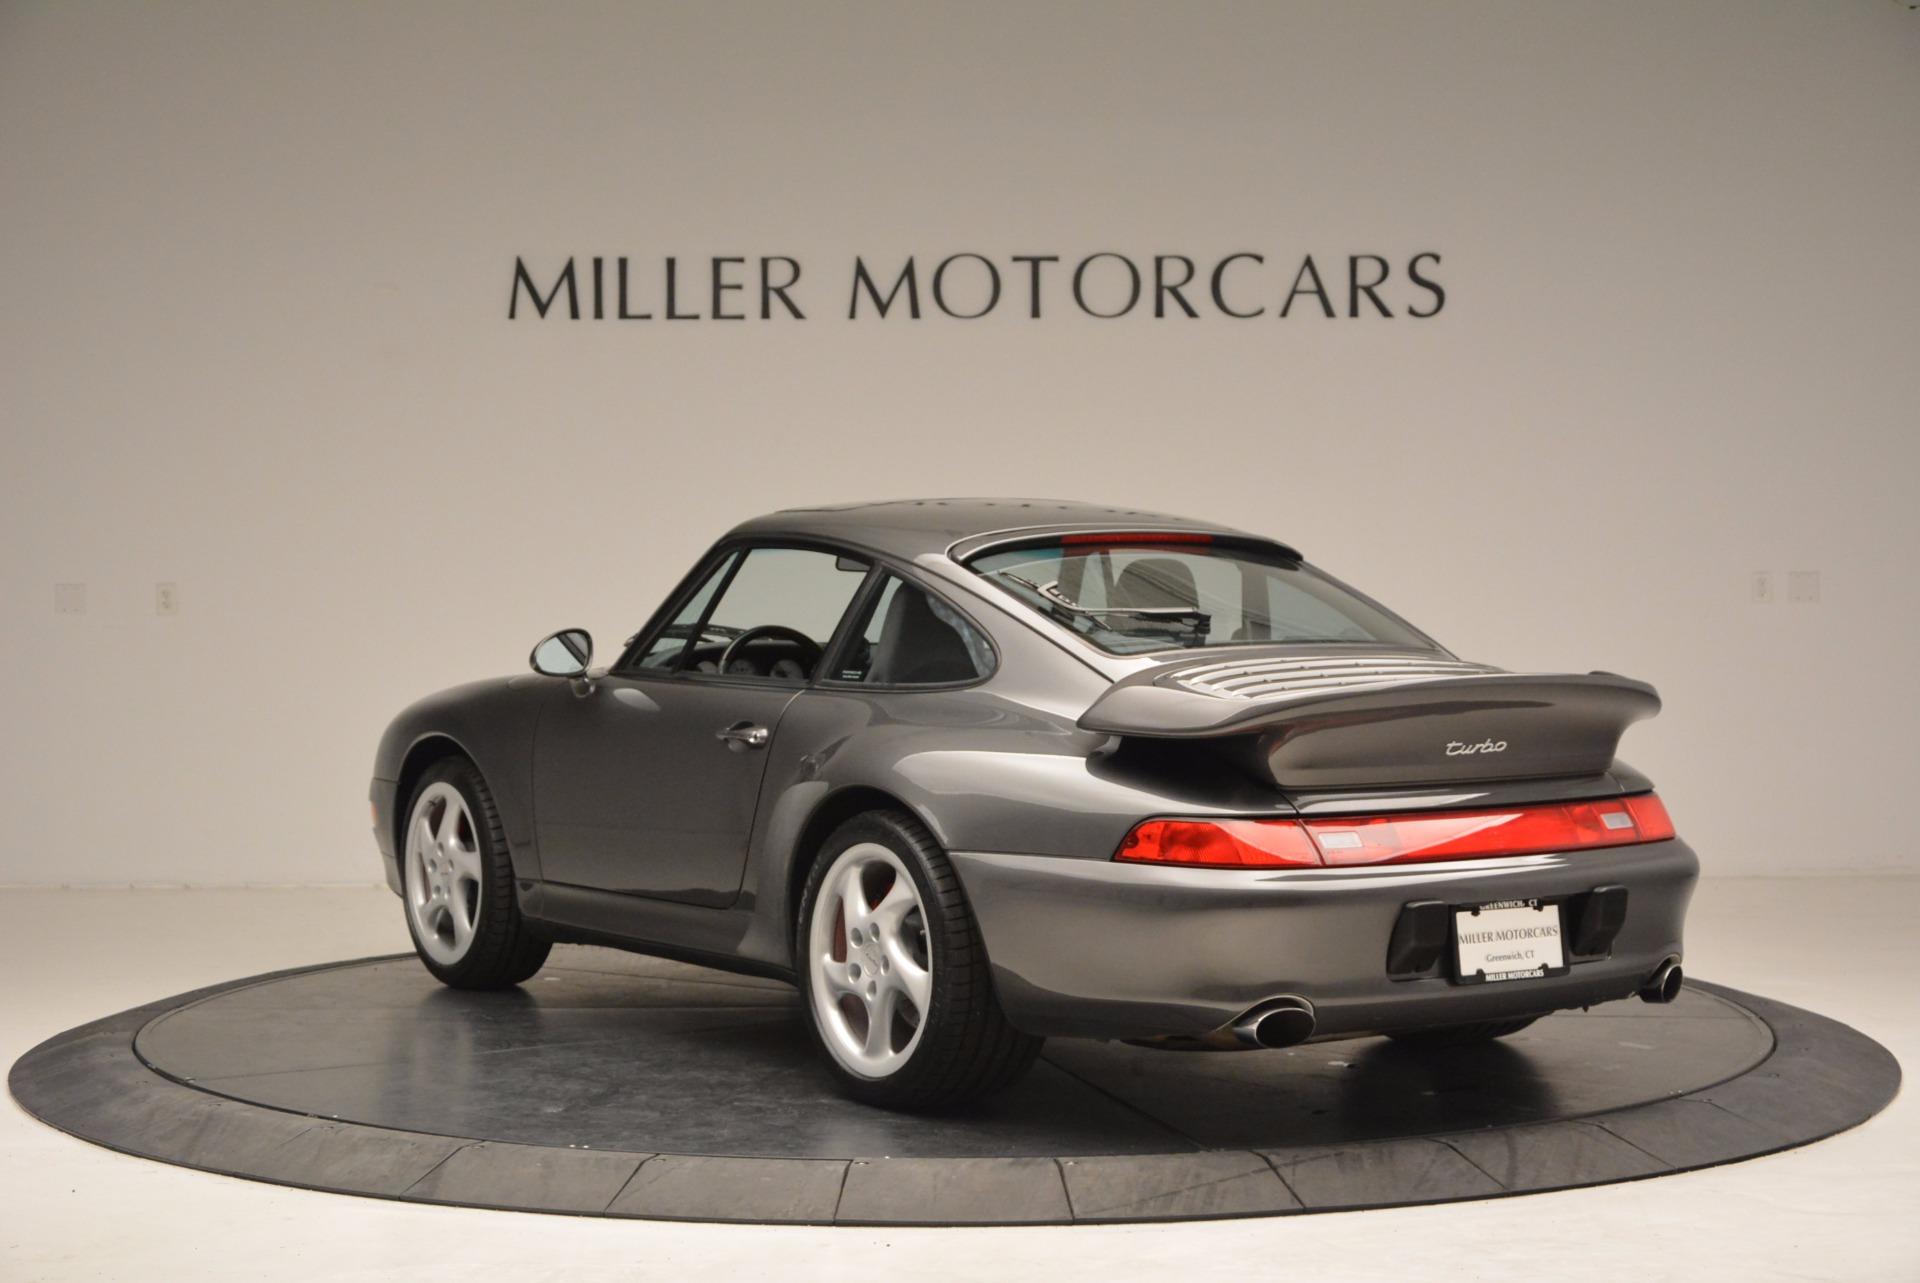 Used 1996 Porsche 911 Turbo For Sale In Greenwich, CT 1058_p5